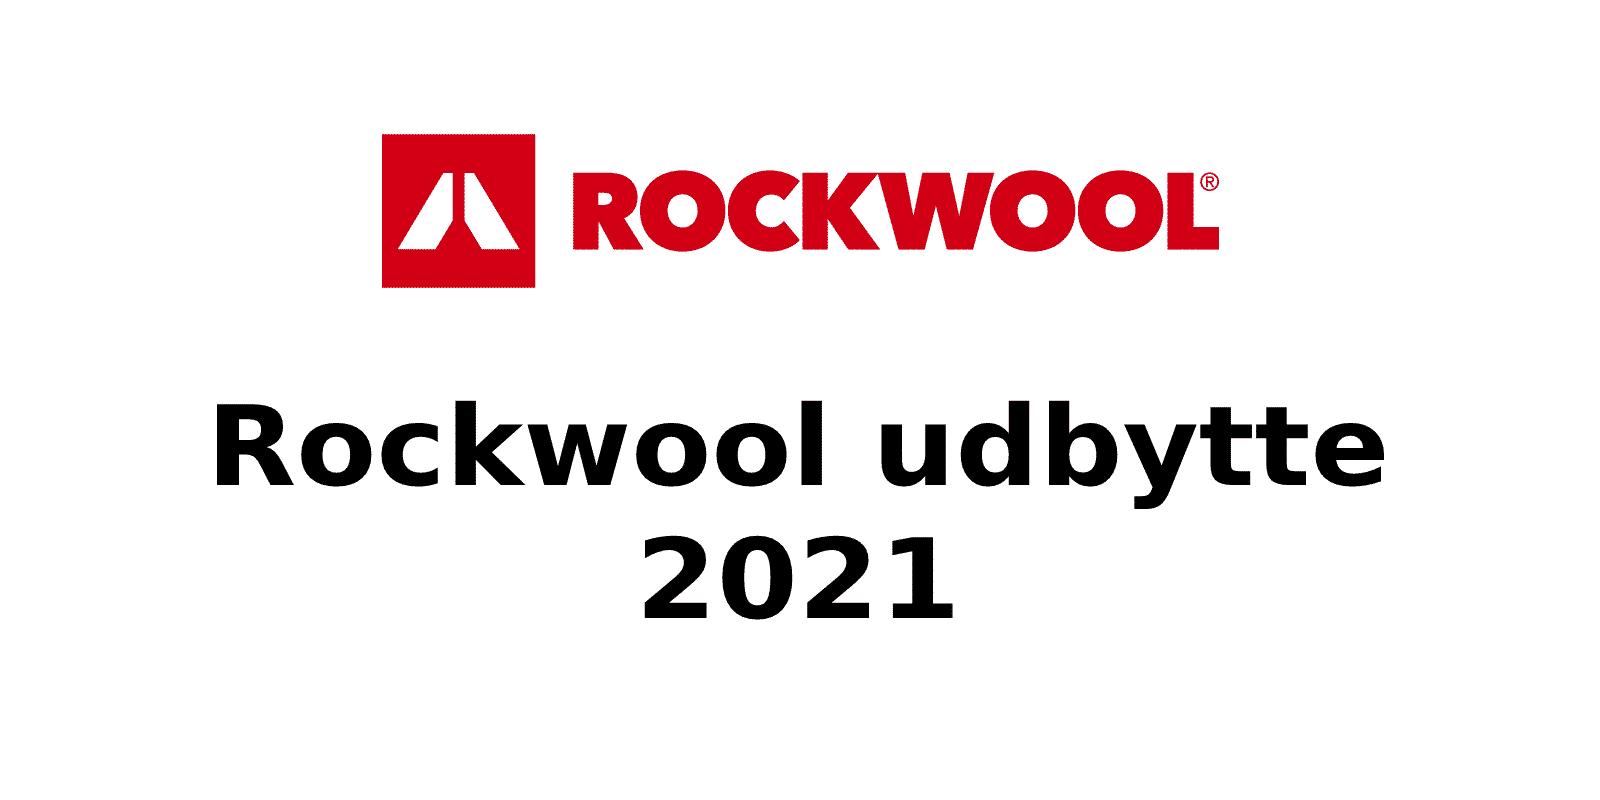 Rockwool udbytte 2021